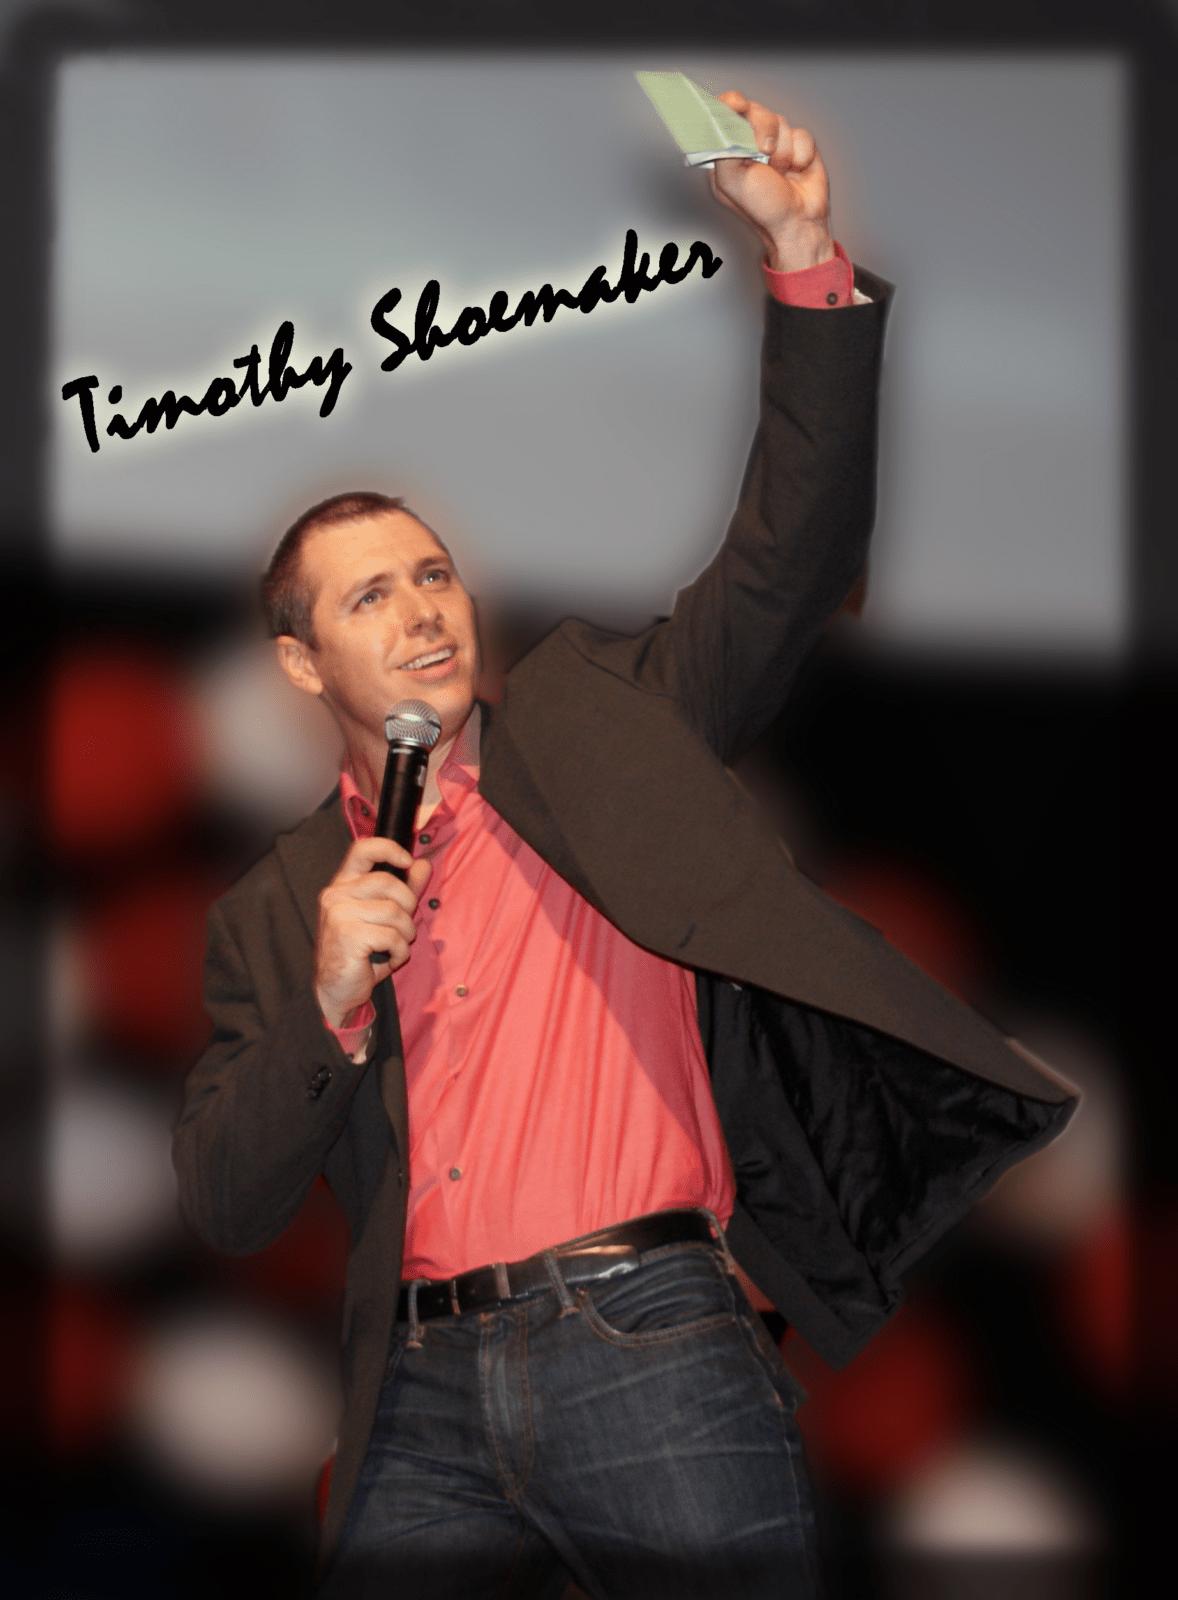 Timothy Shoemaker